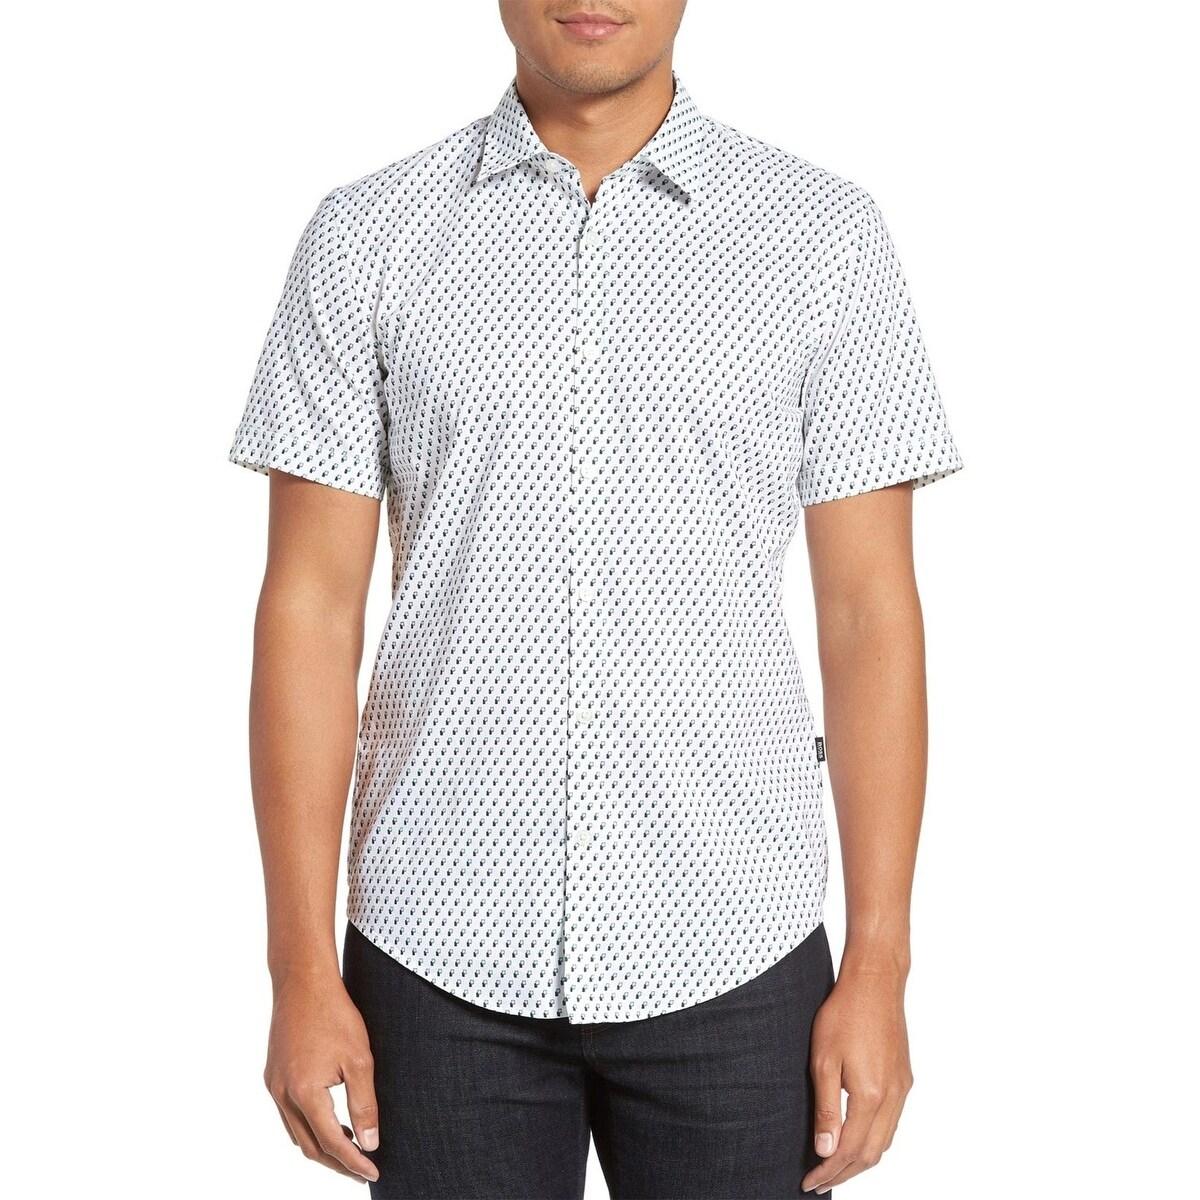 Hugo Boss Button Down Shirt Ronn Printed Cotton Slim Fit Size Xl Short Sleeves